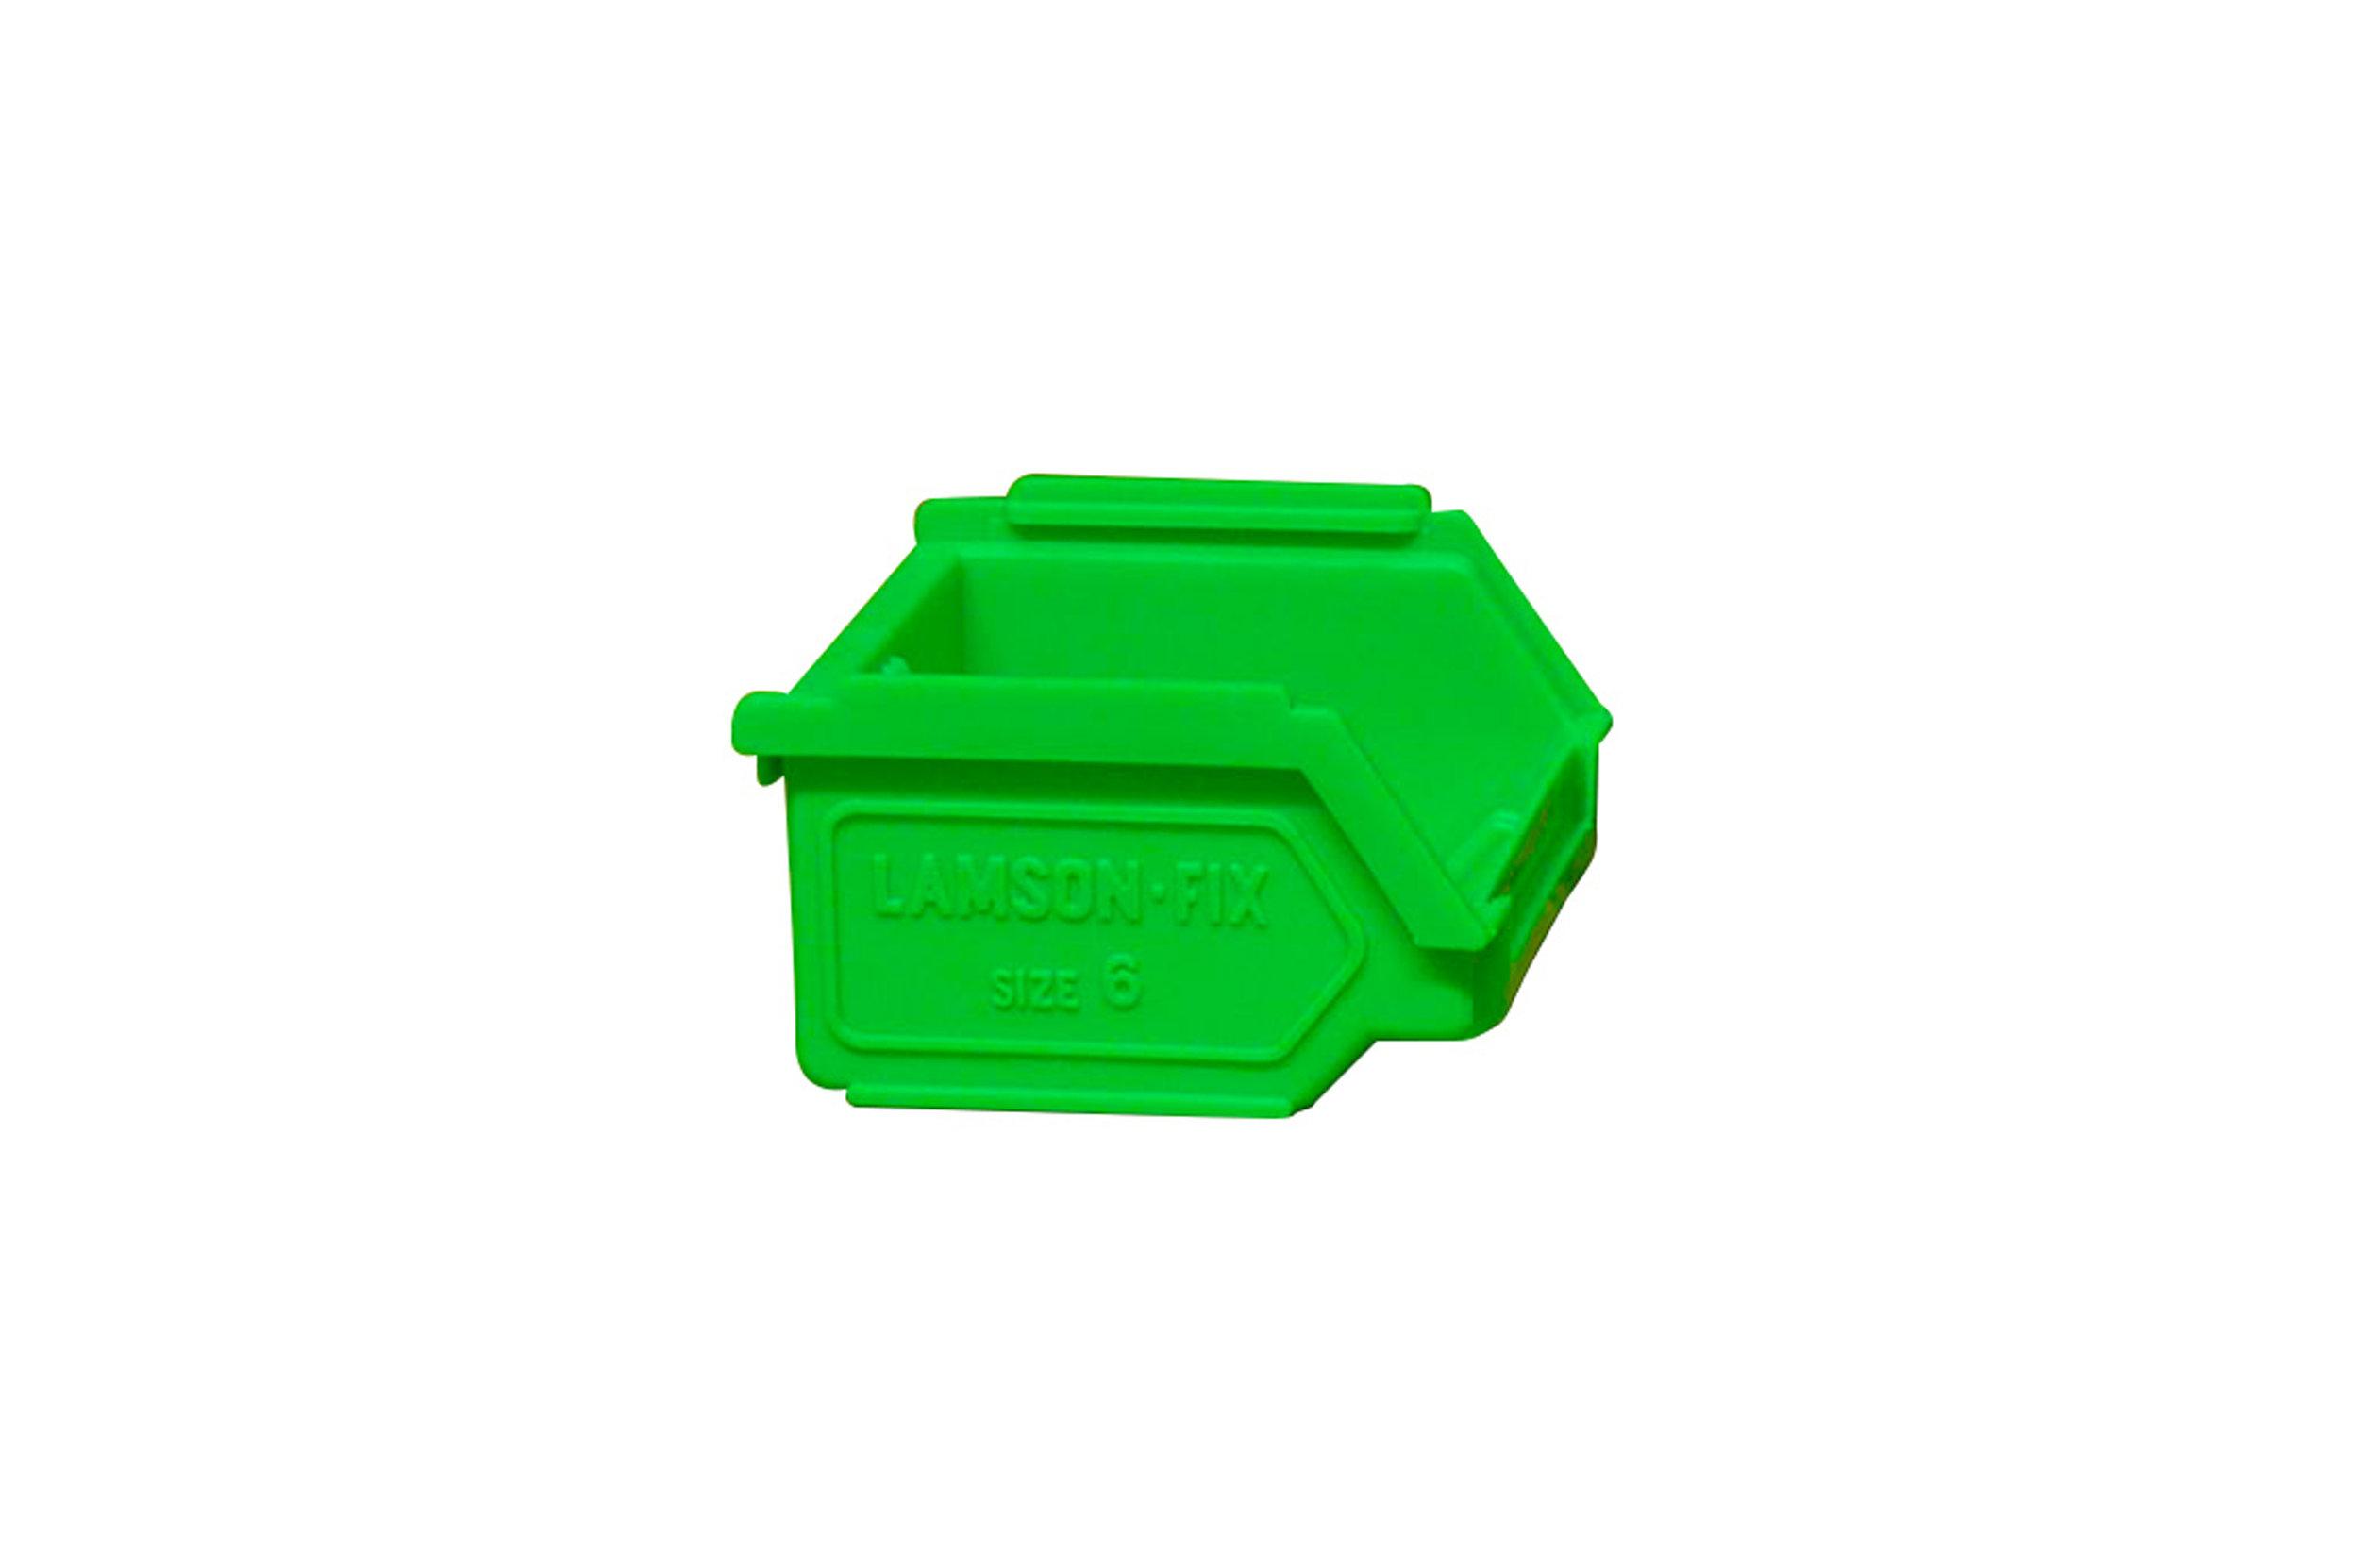 Size 6 Green (Image 6).jpg